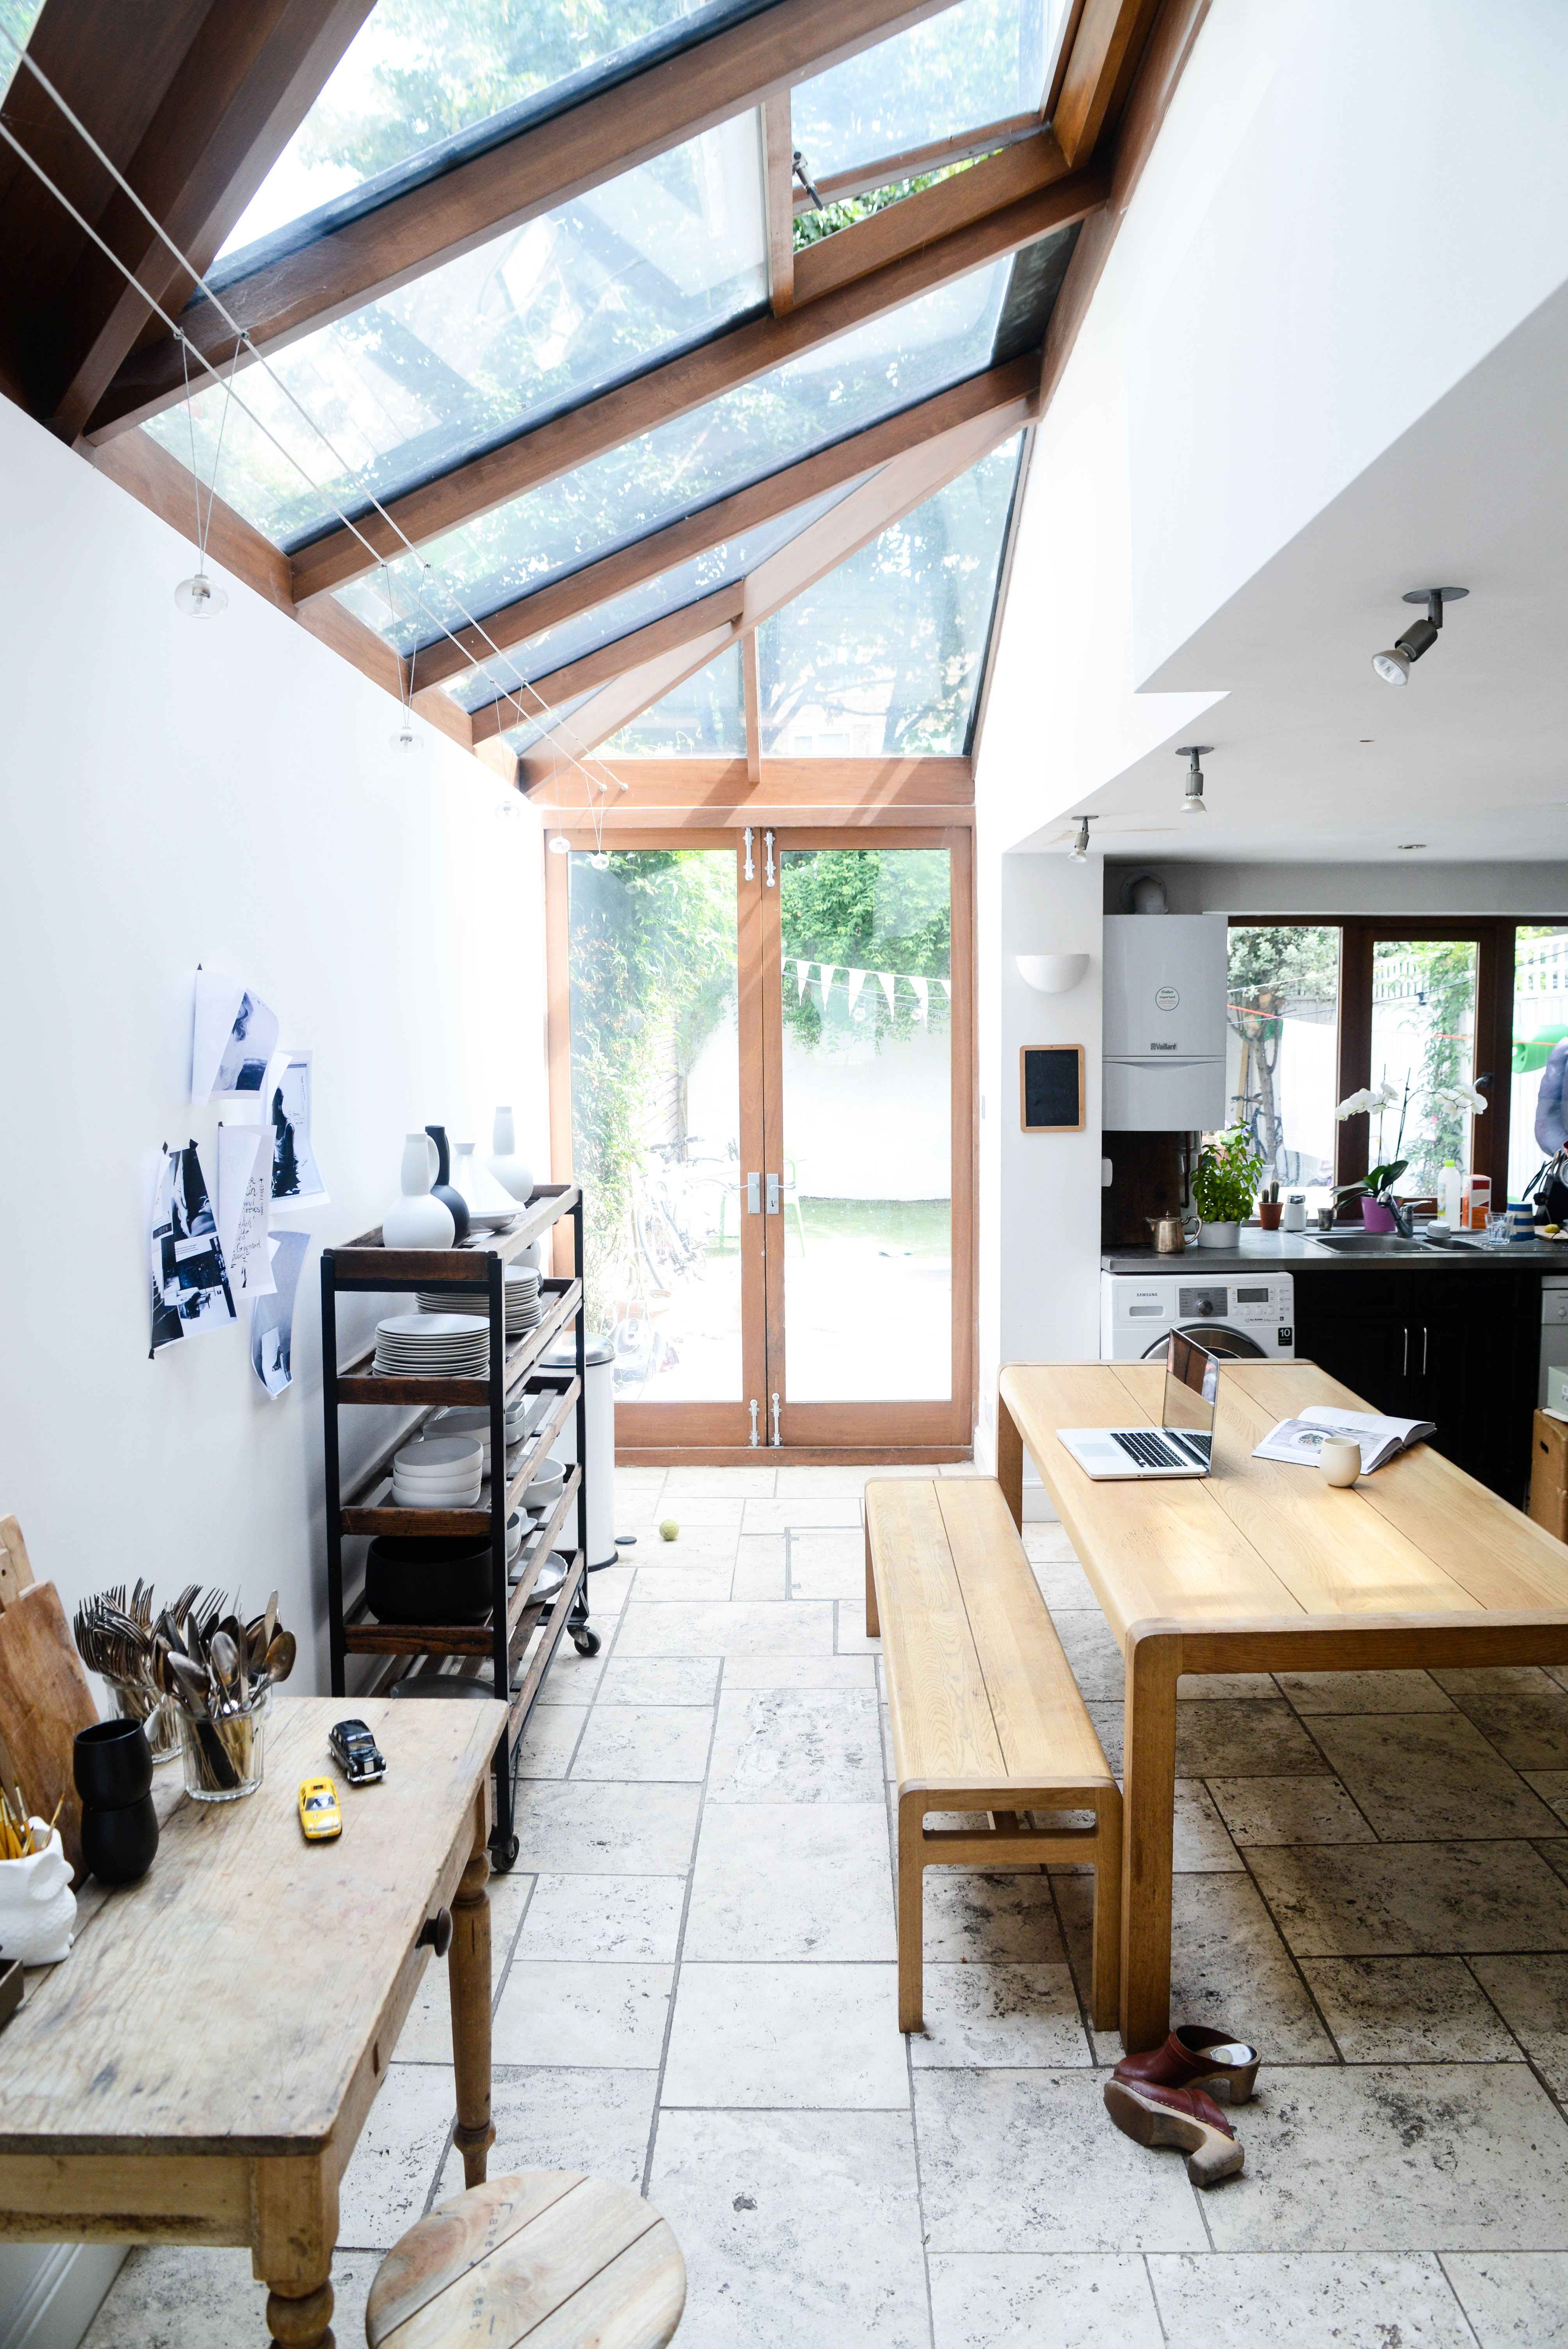 Yvestown in the Kitchen - Avenue Lifestyle Avenue Lifestyle